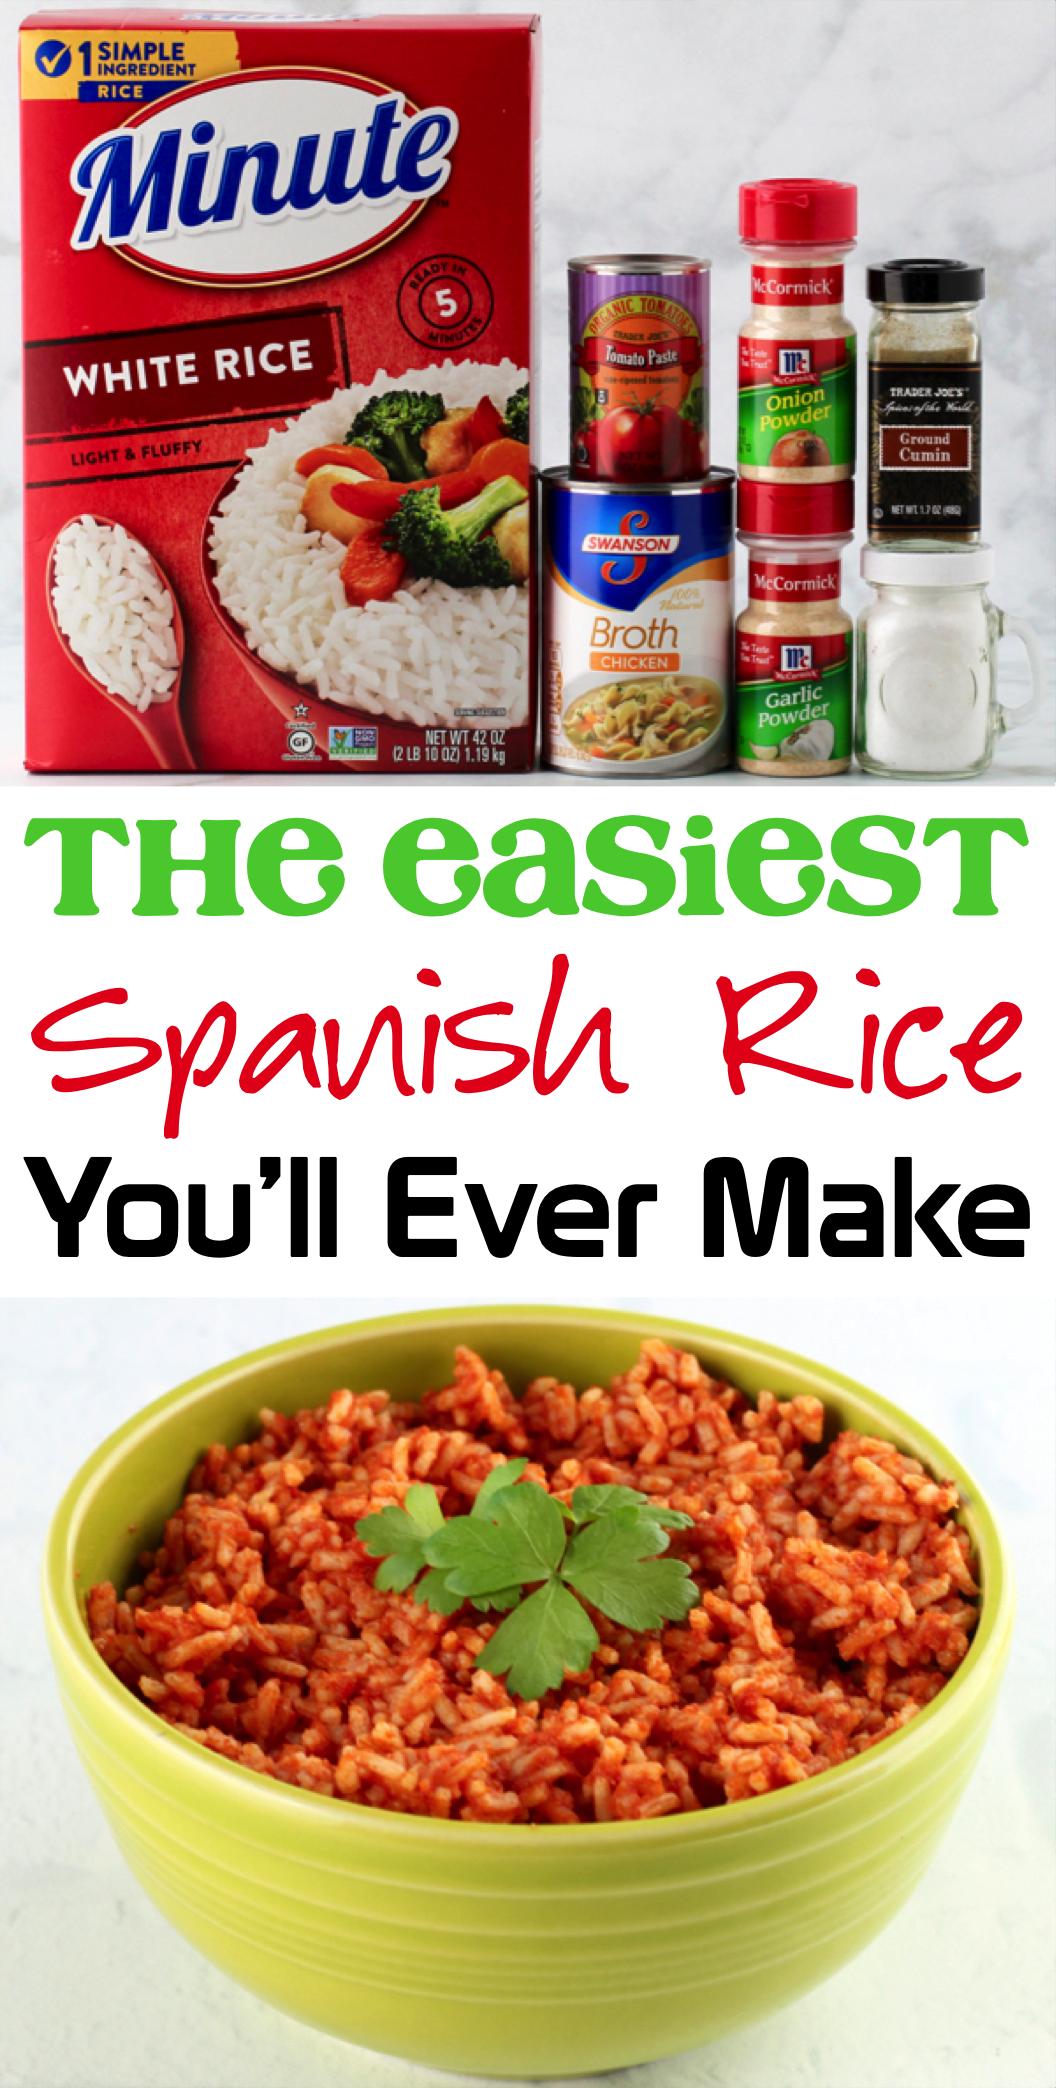 ecd5c5fbcbaa8c6cfb97817285807d37 - Better Homes And Gardens Spanish Rice Recipe